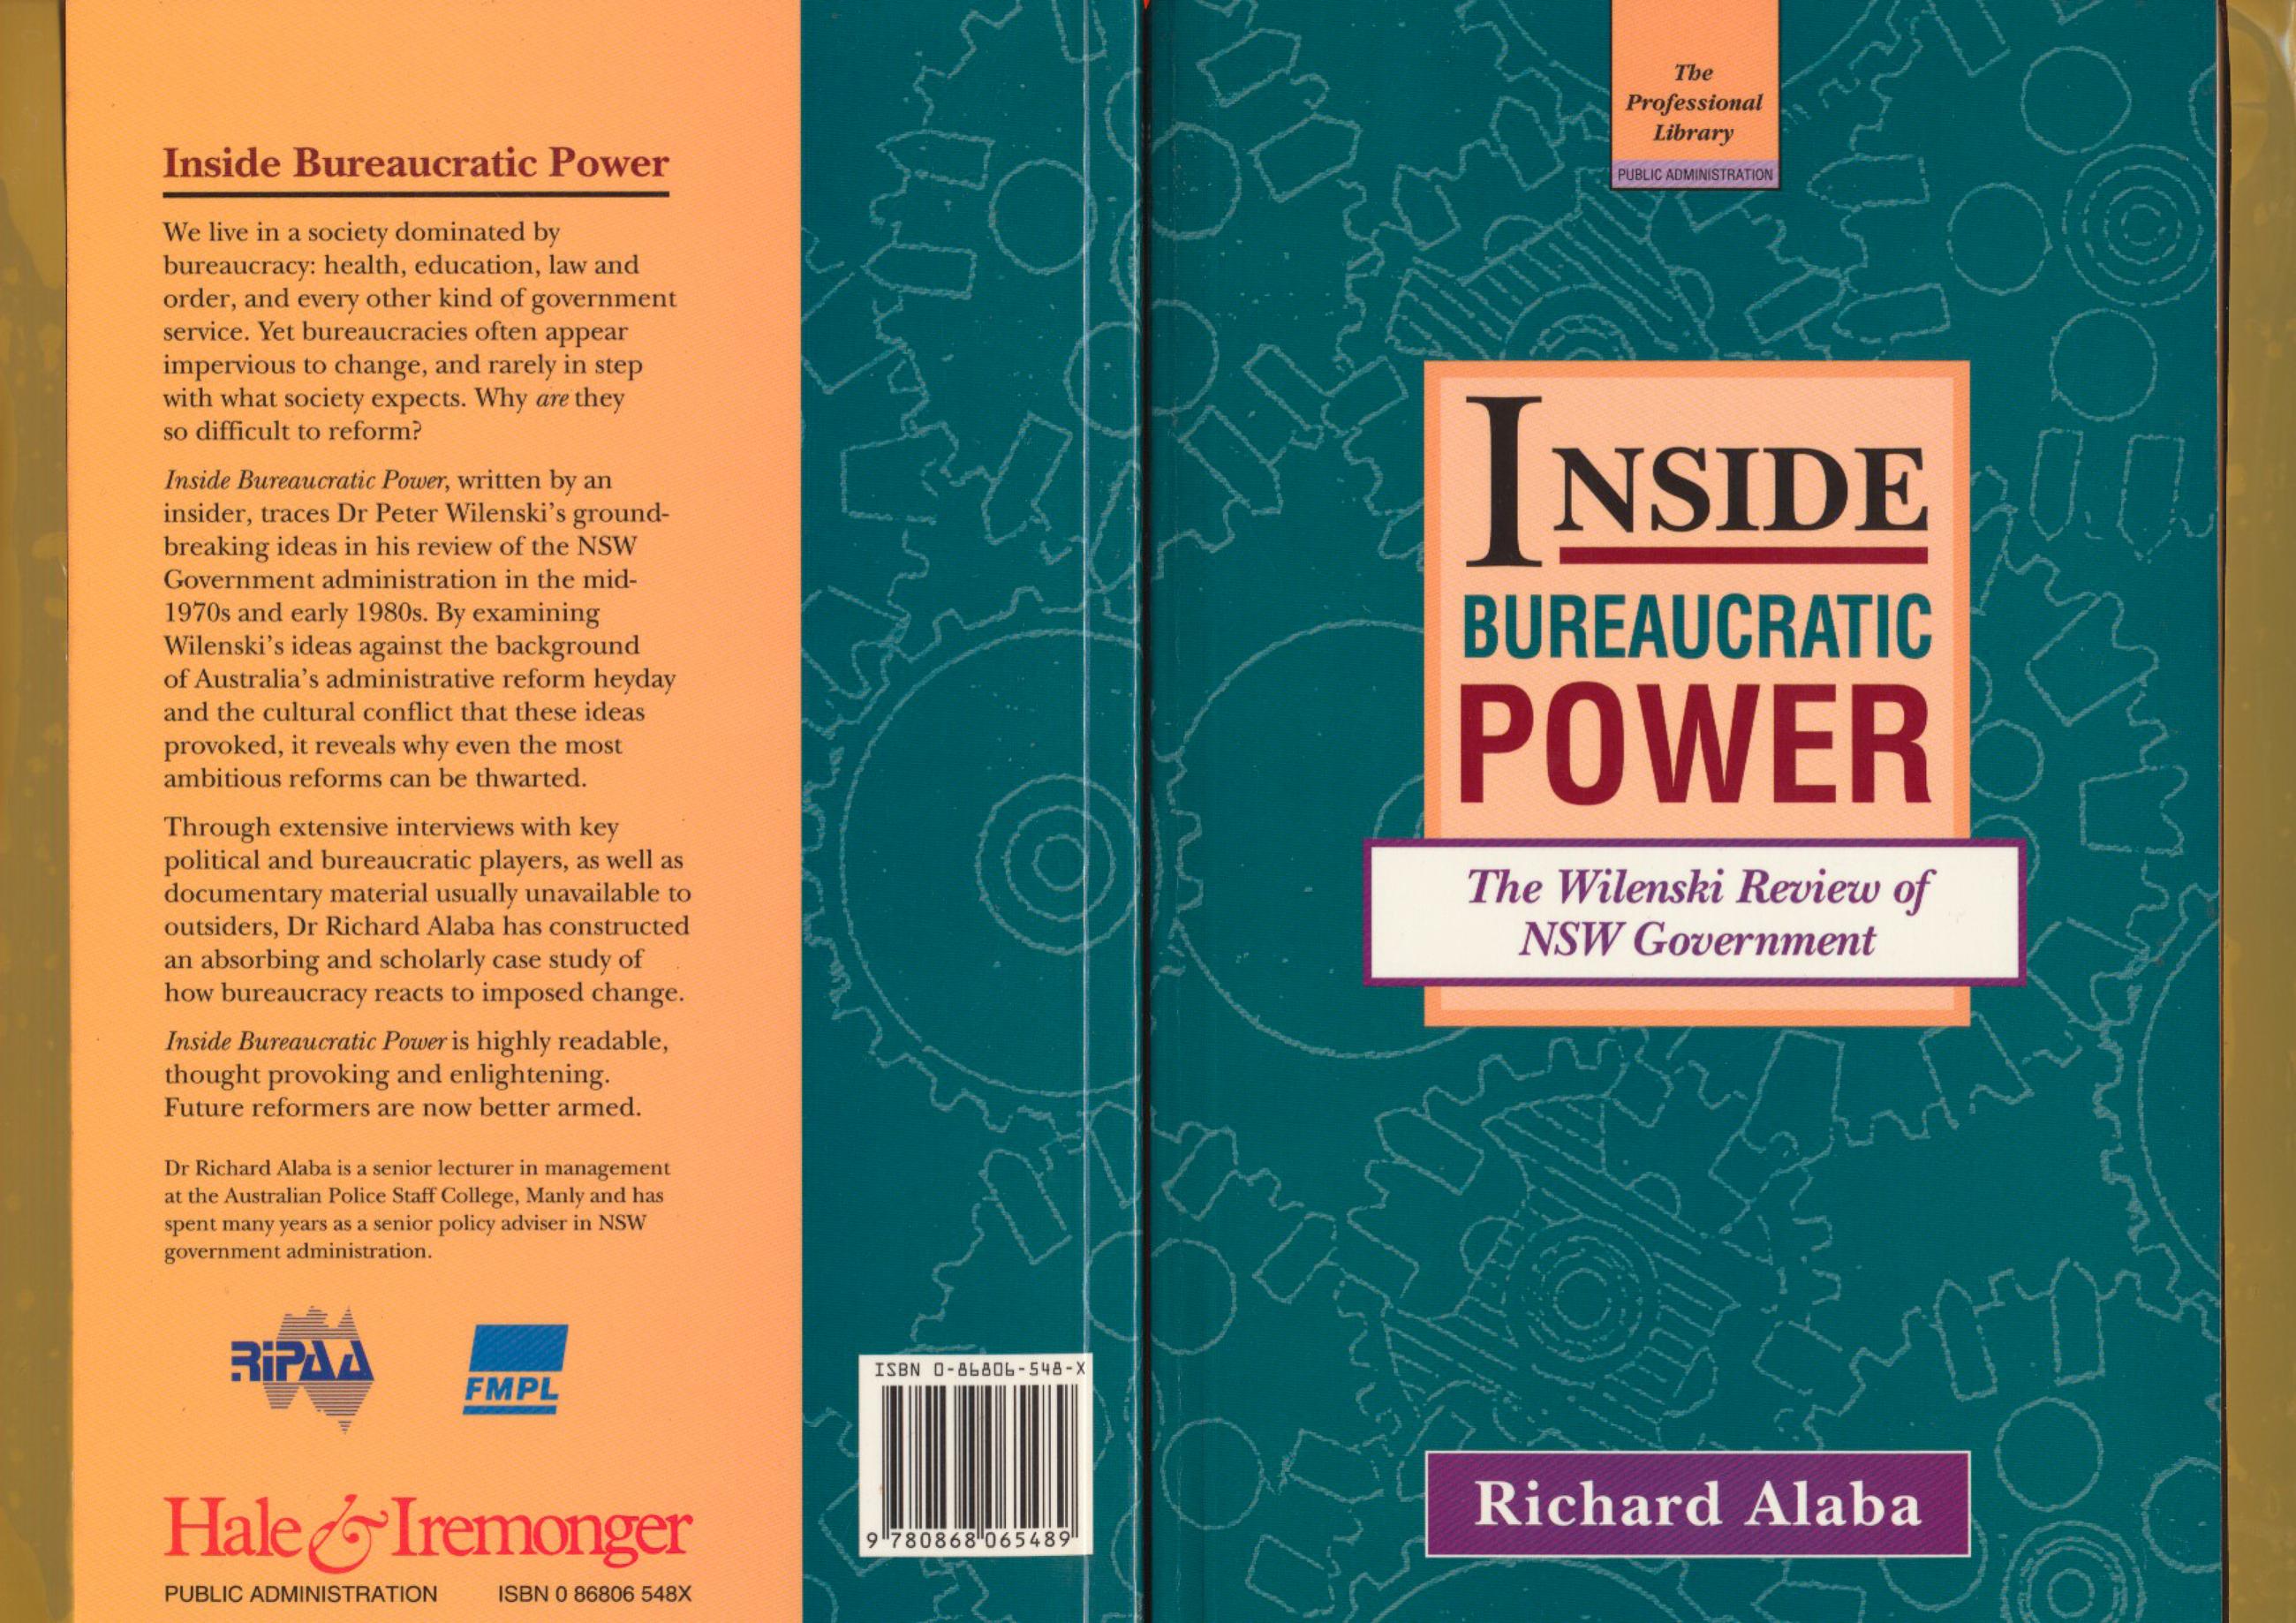 Inside Bureaucratic Power-1.jpg